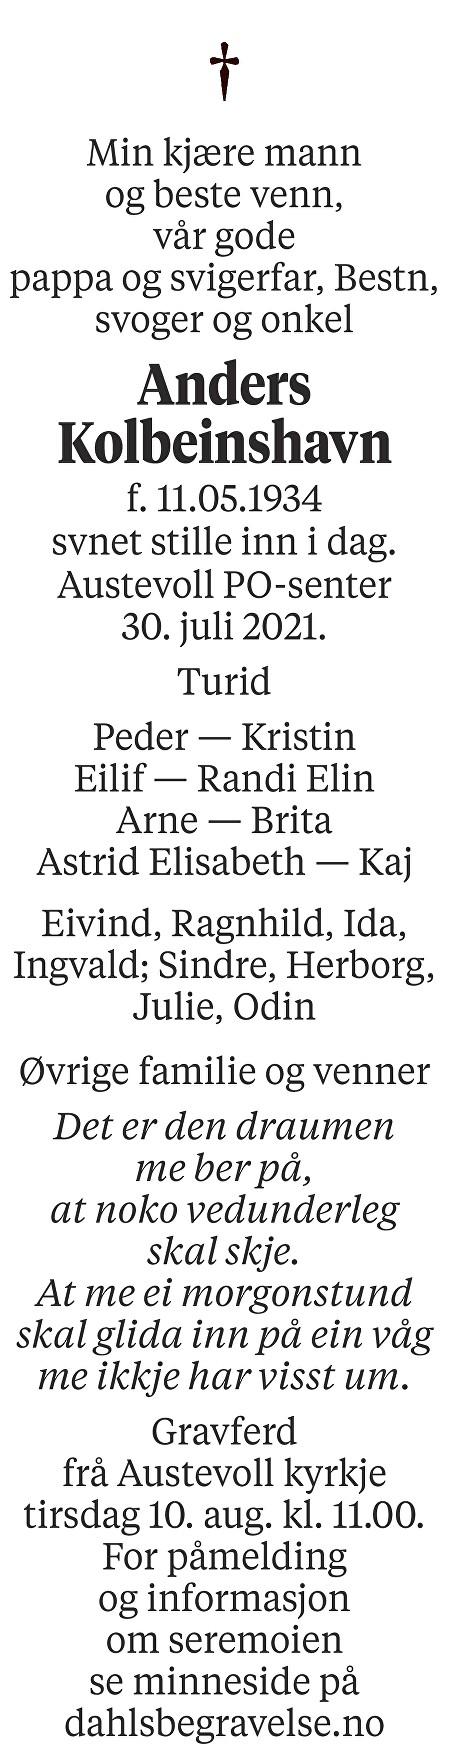 Anders Kolbeinshavn Dødsannonse